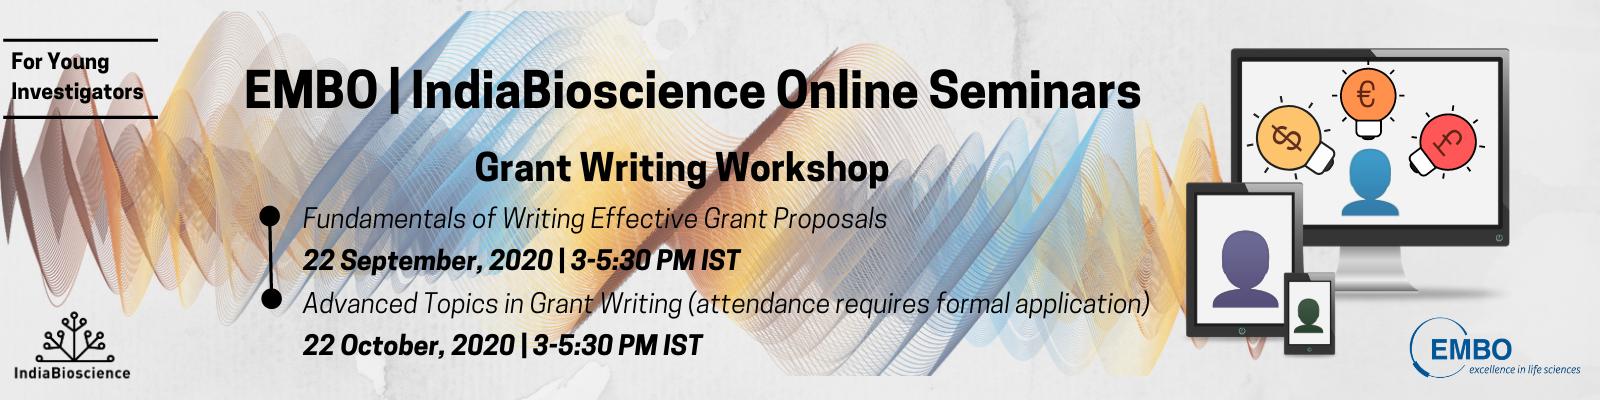 EMBO India Bioscience Grant Writing YI Banner Final2